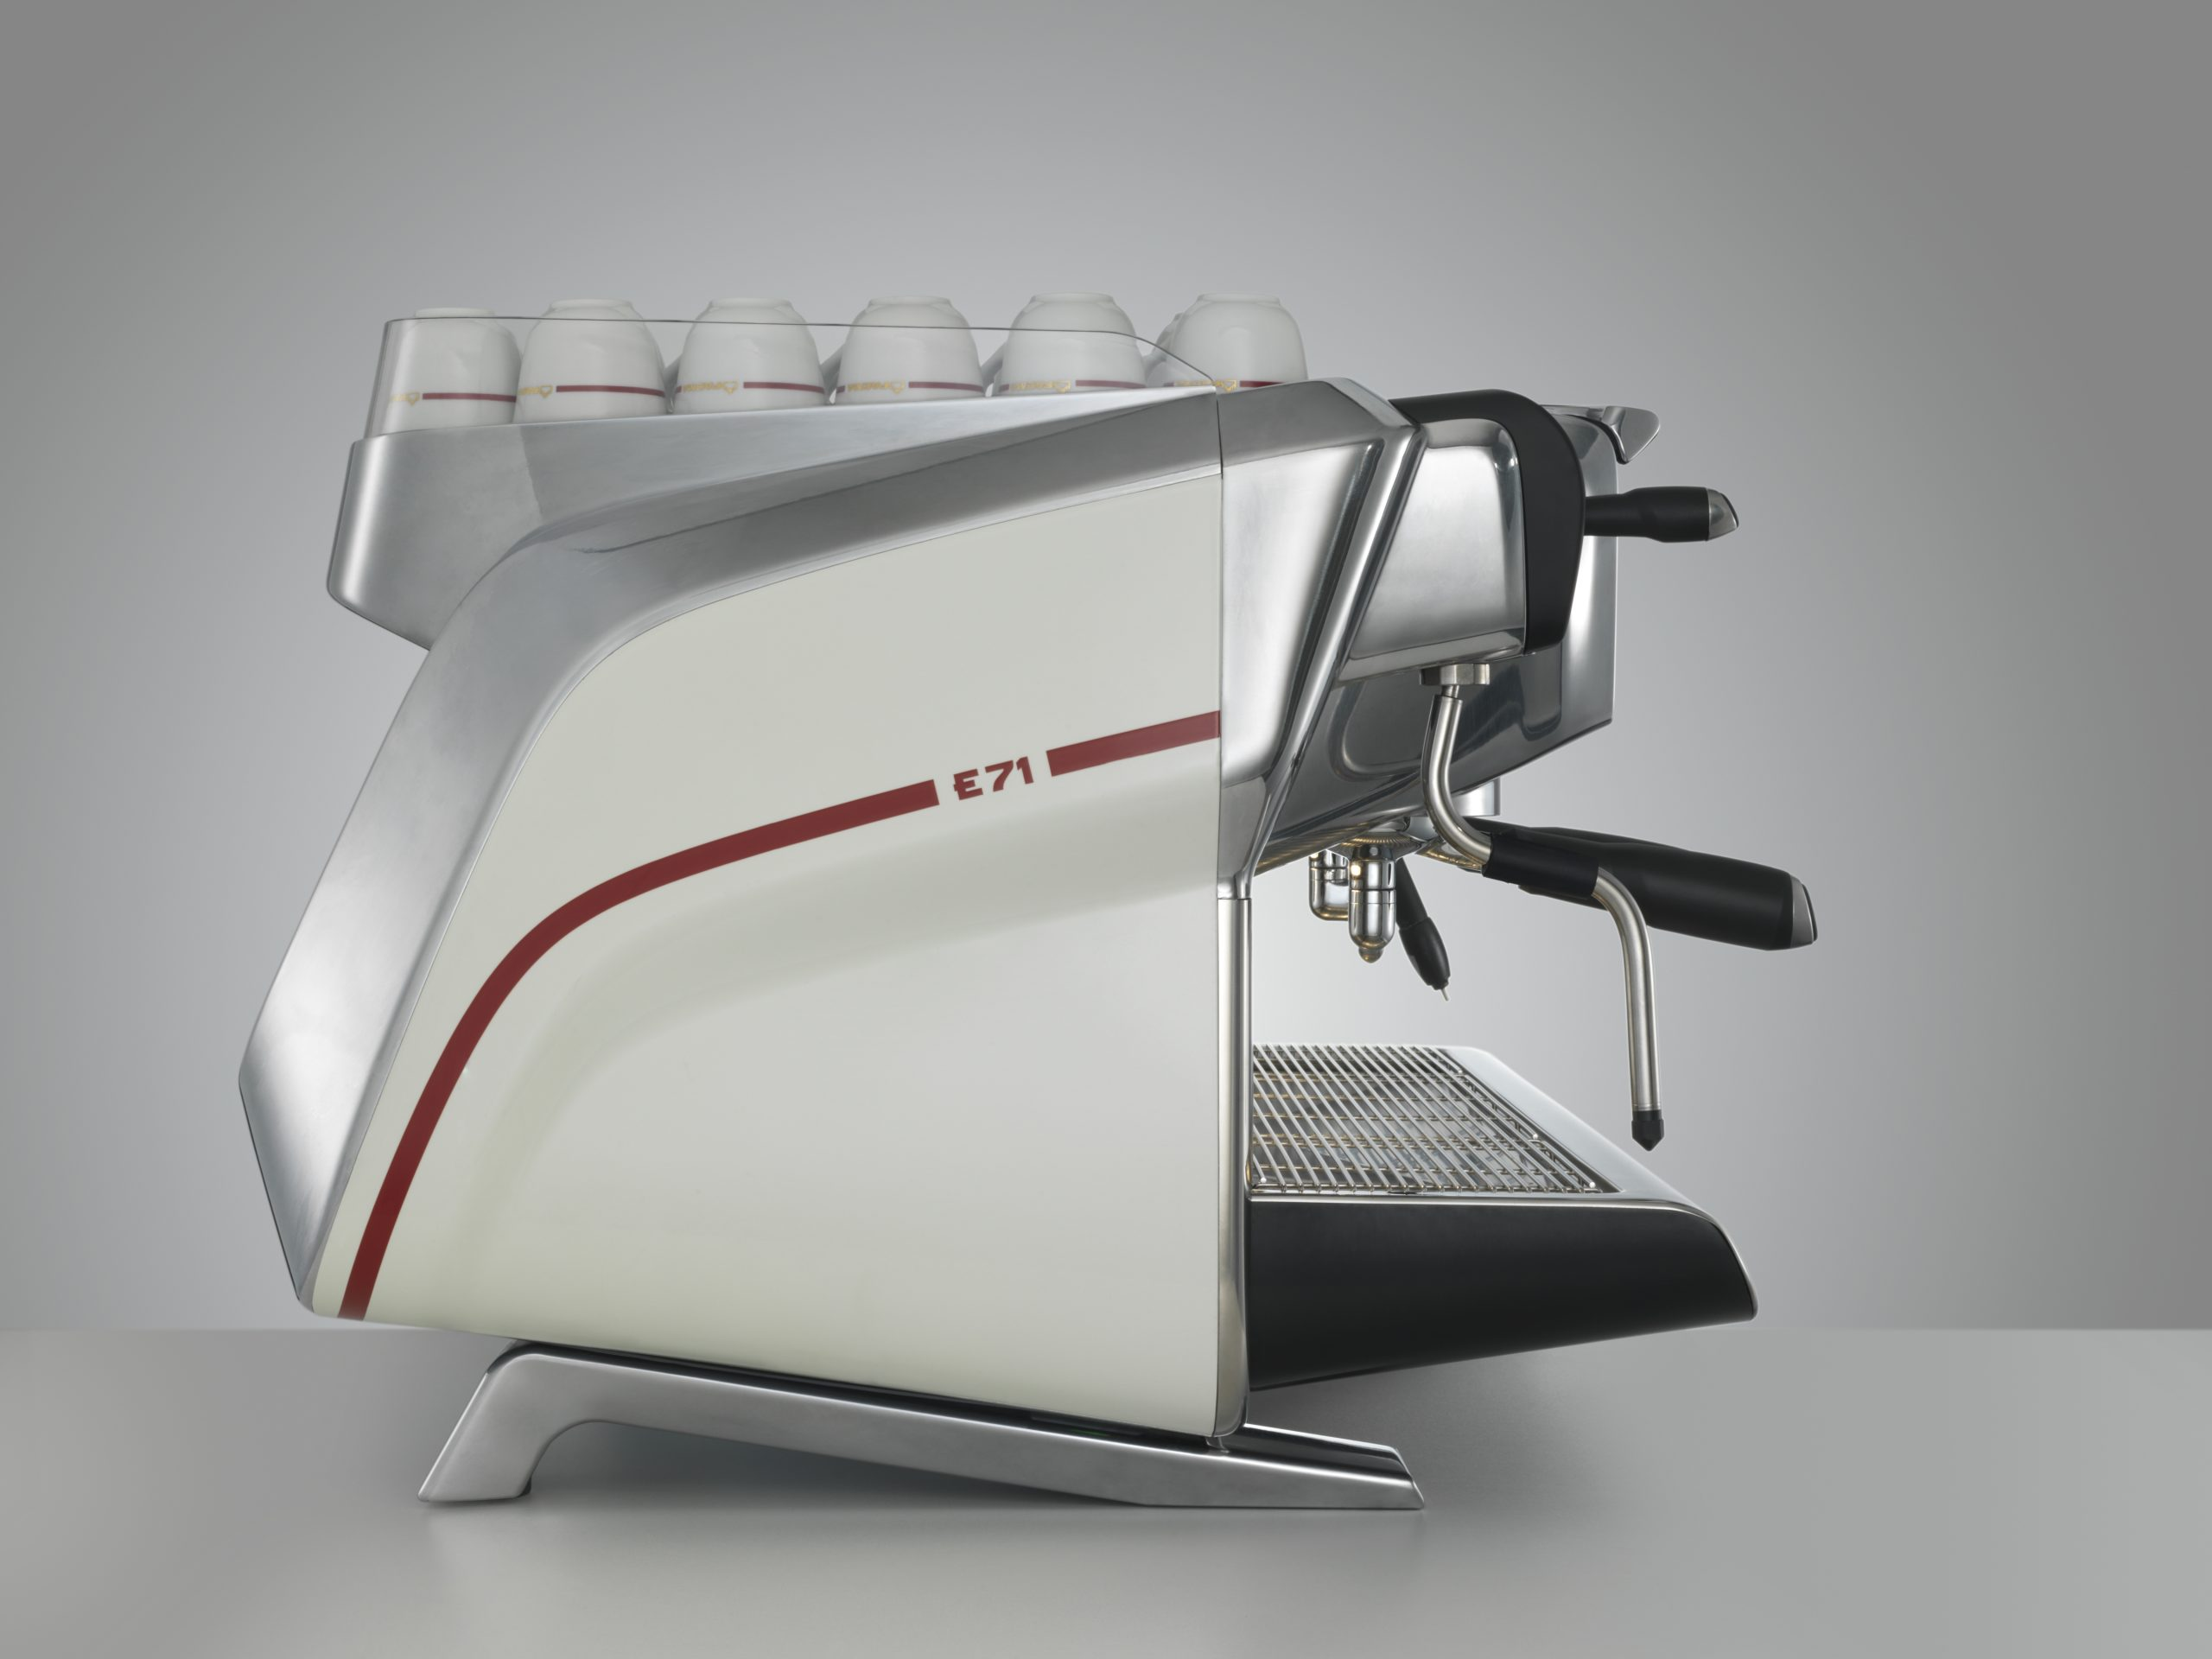 Faema E71 side, white